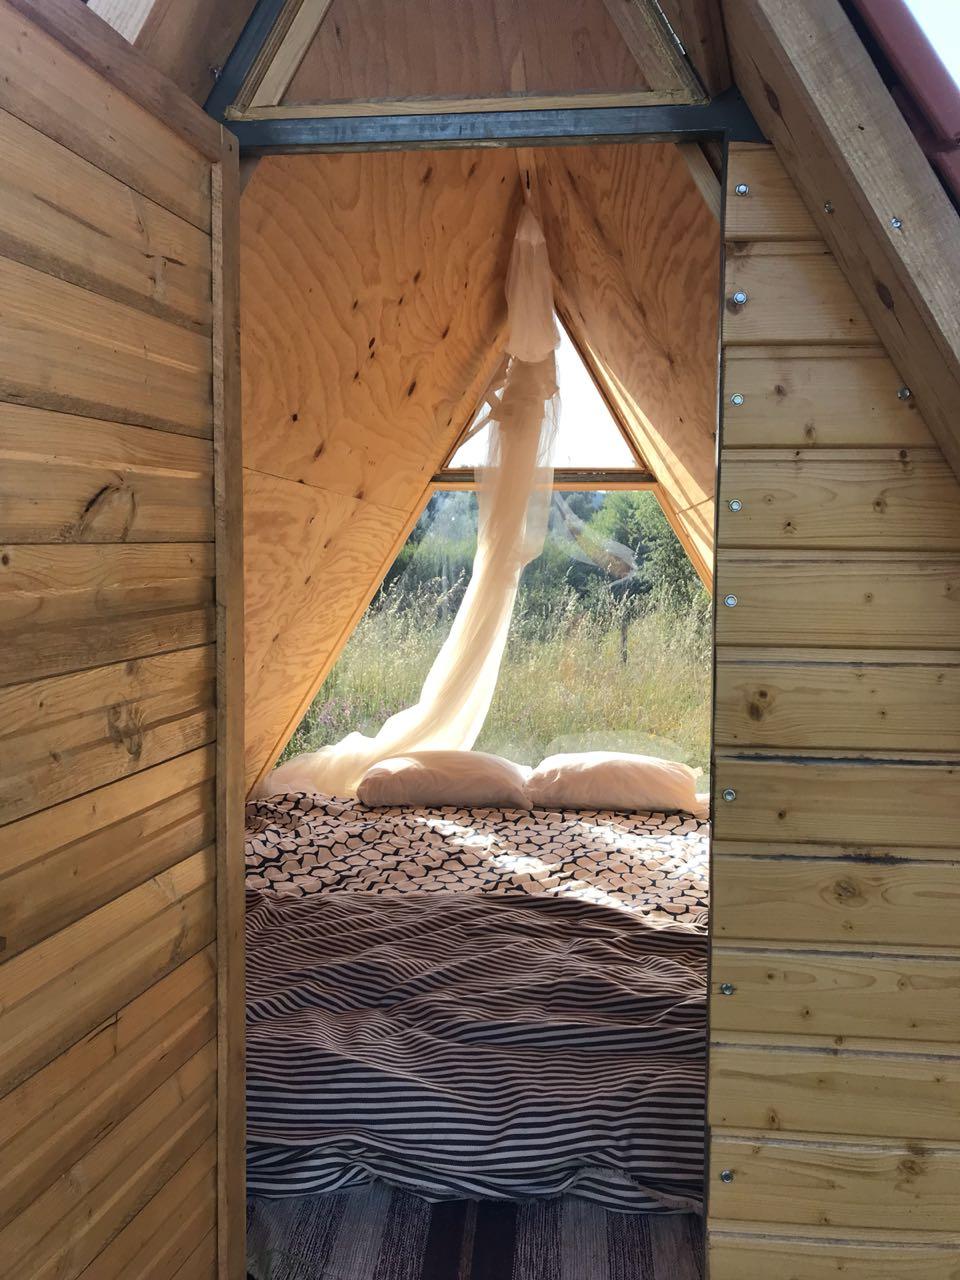 cabins.jpeg